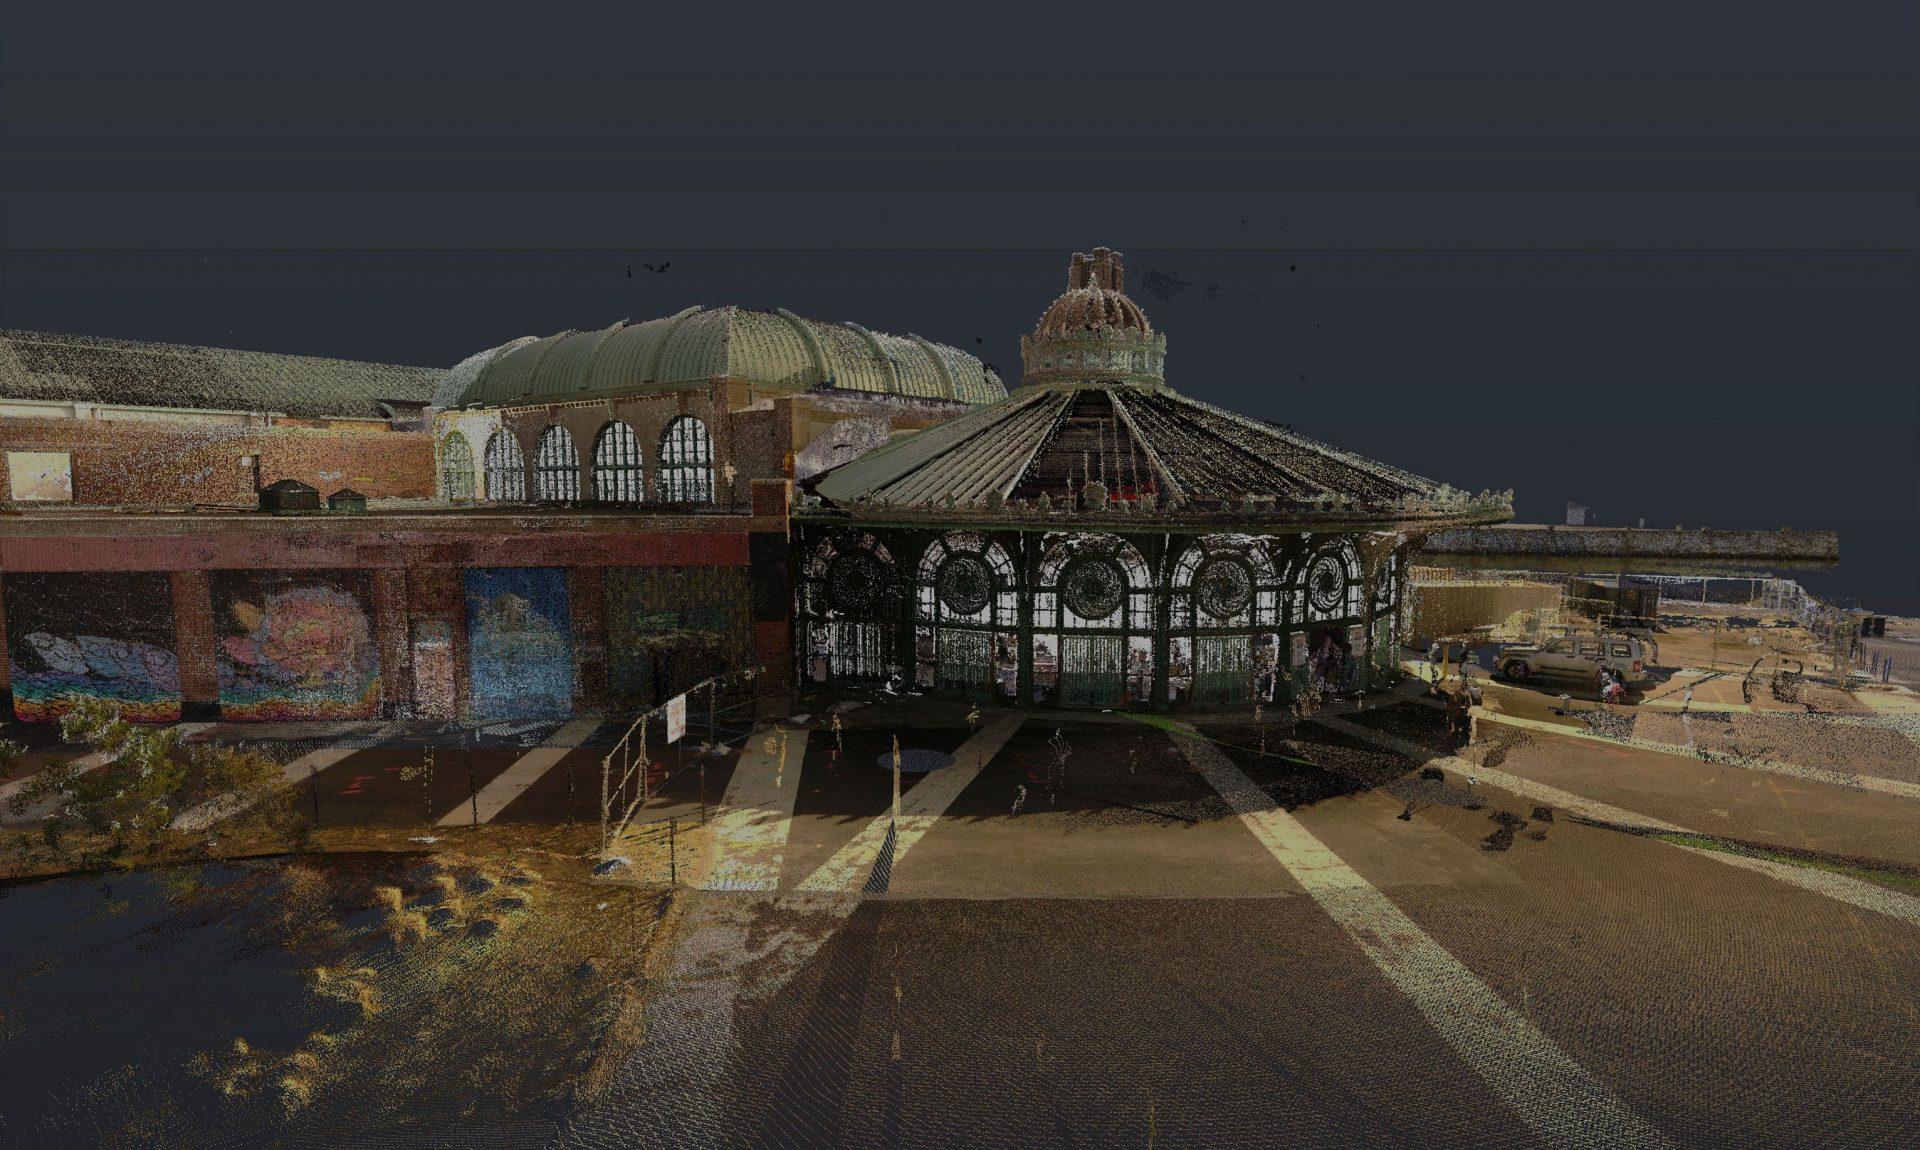 asboury park casino